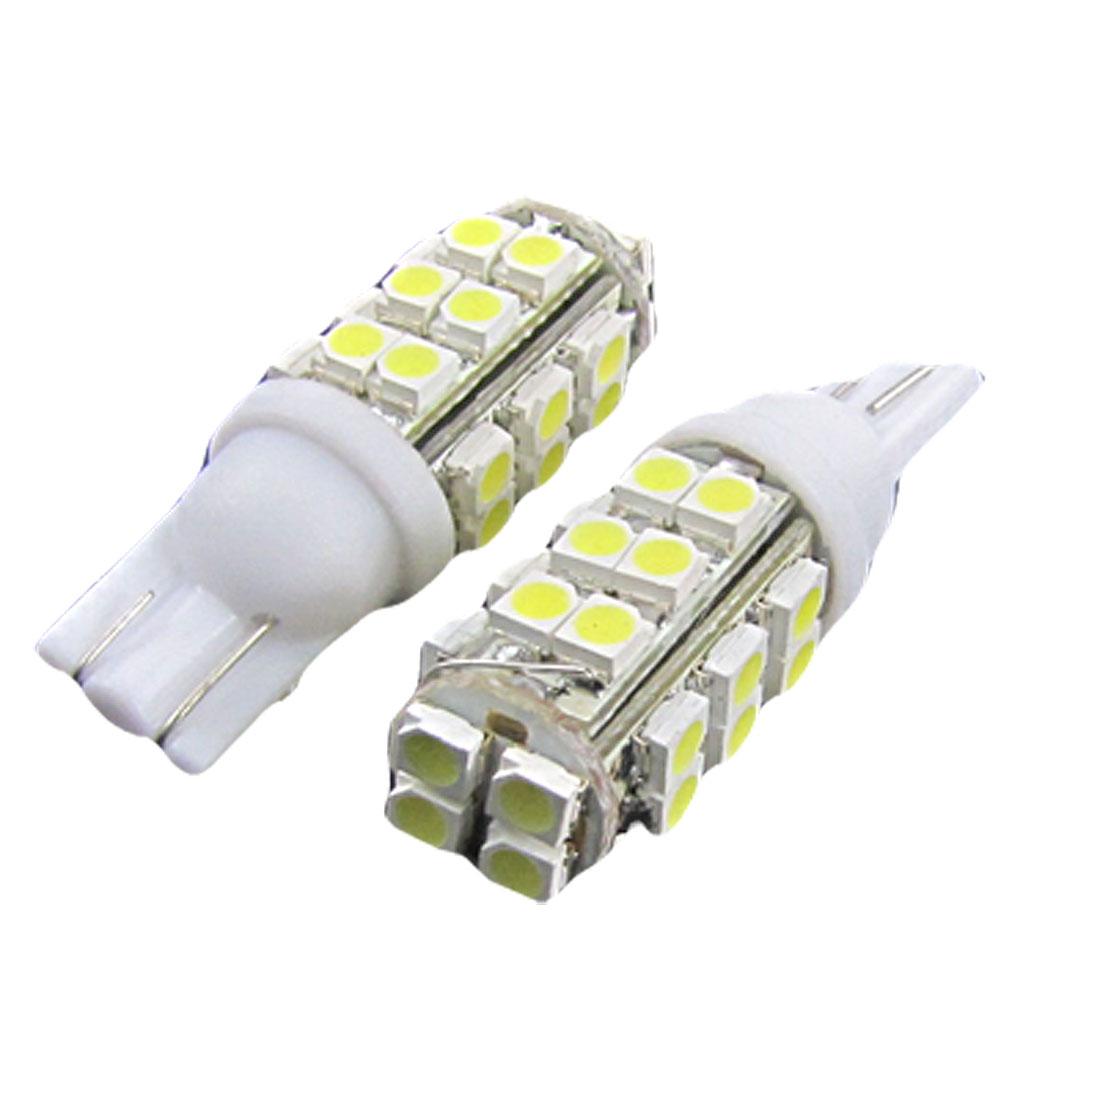 Car T10 W5W 28 1210 SMD LED White Signal Indicator Wedge Light Bulb 2 Pcs